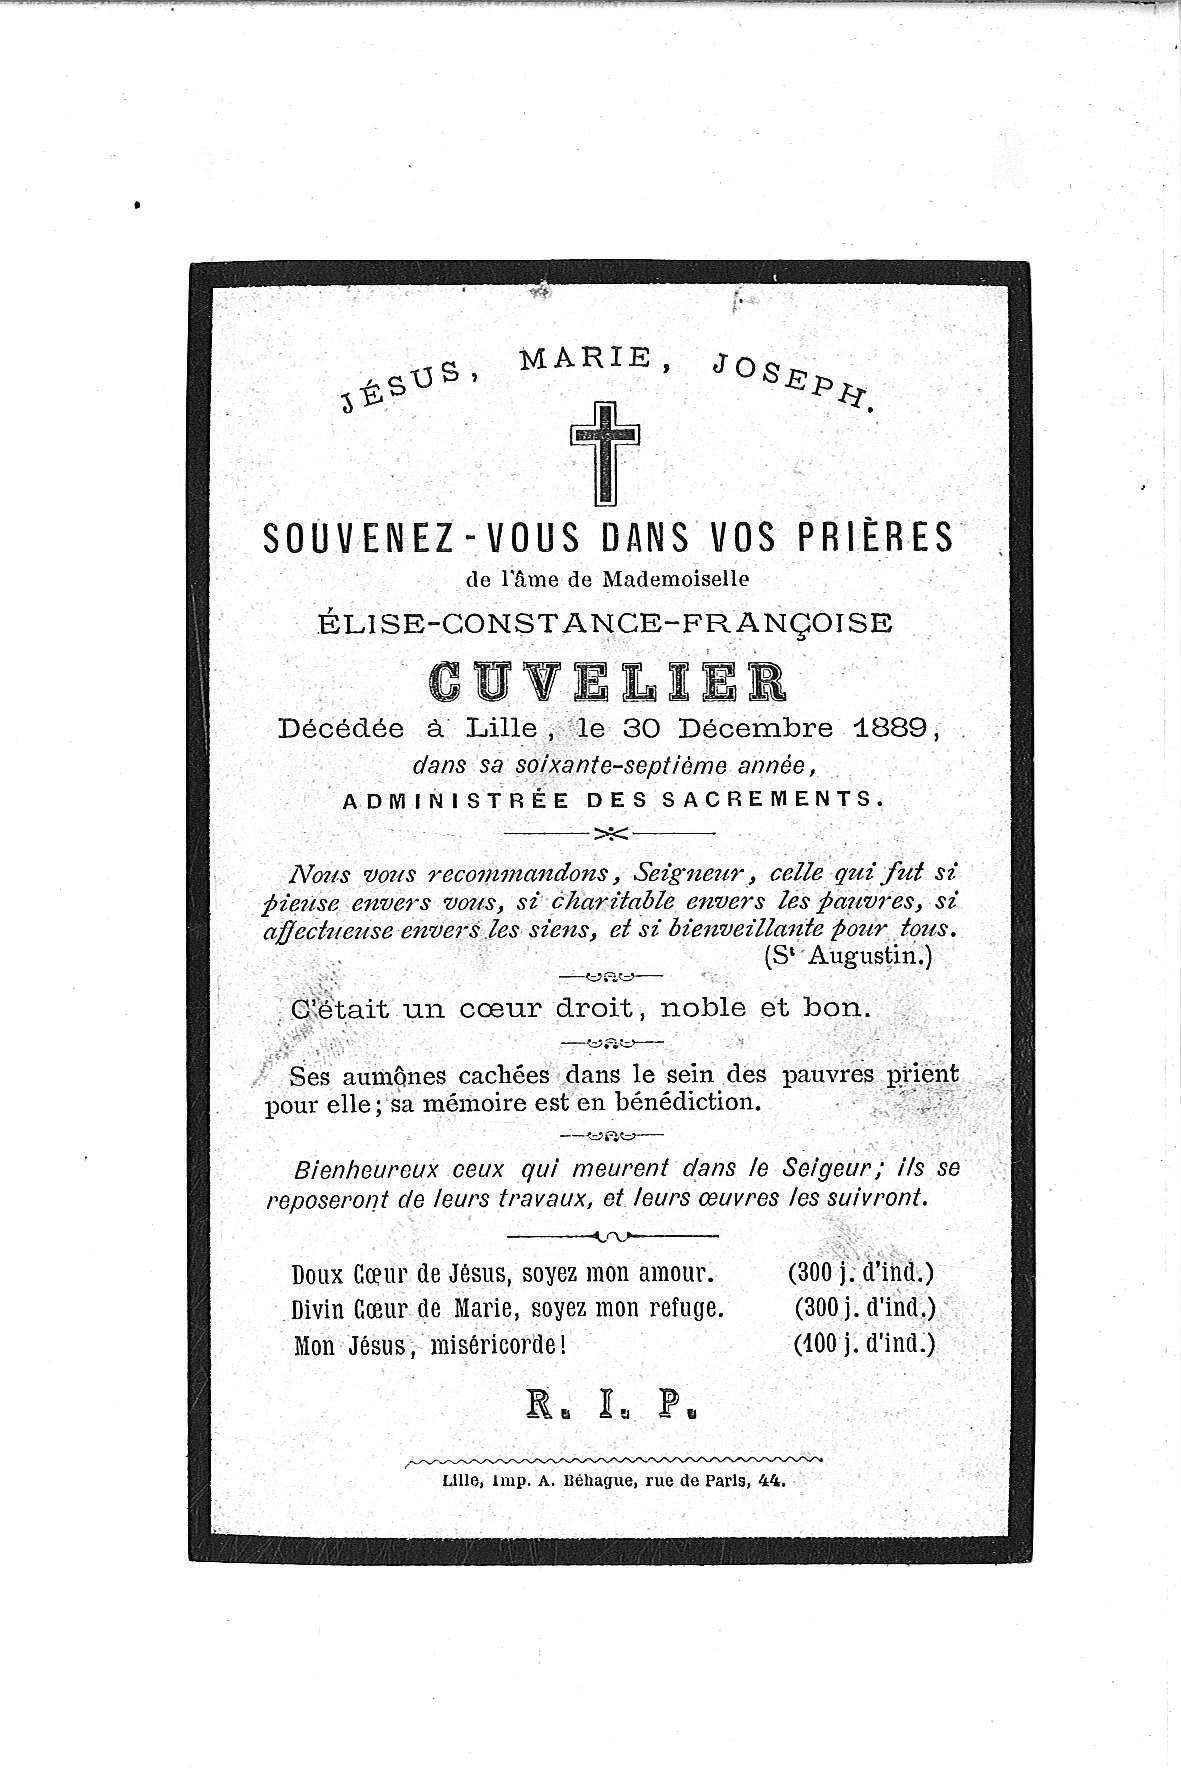 élise-constance-françoise(1889)20120329074916_00021.jpg